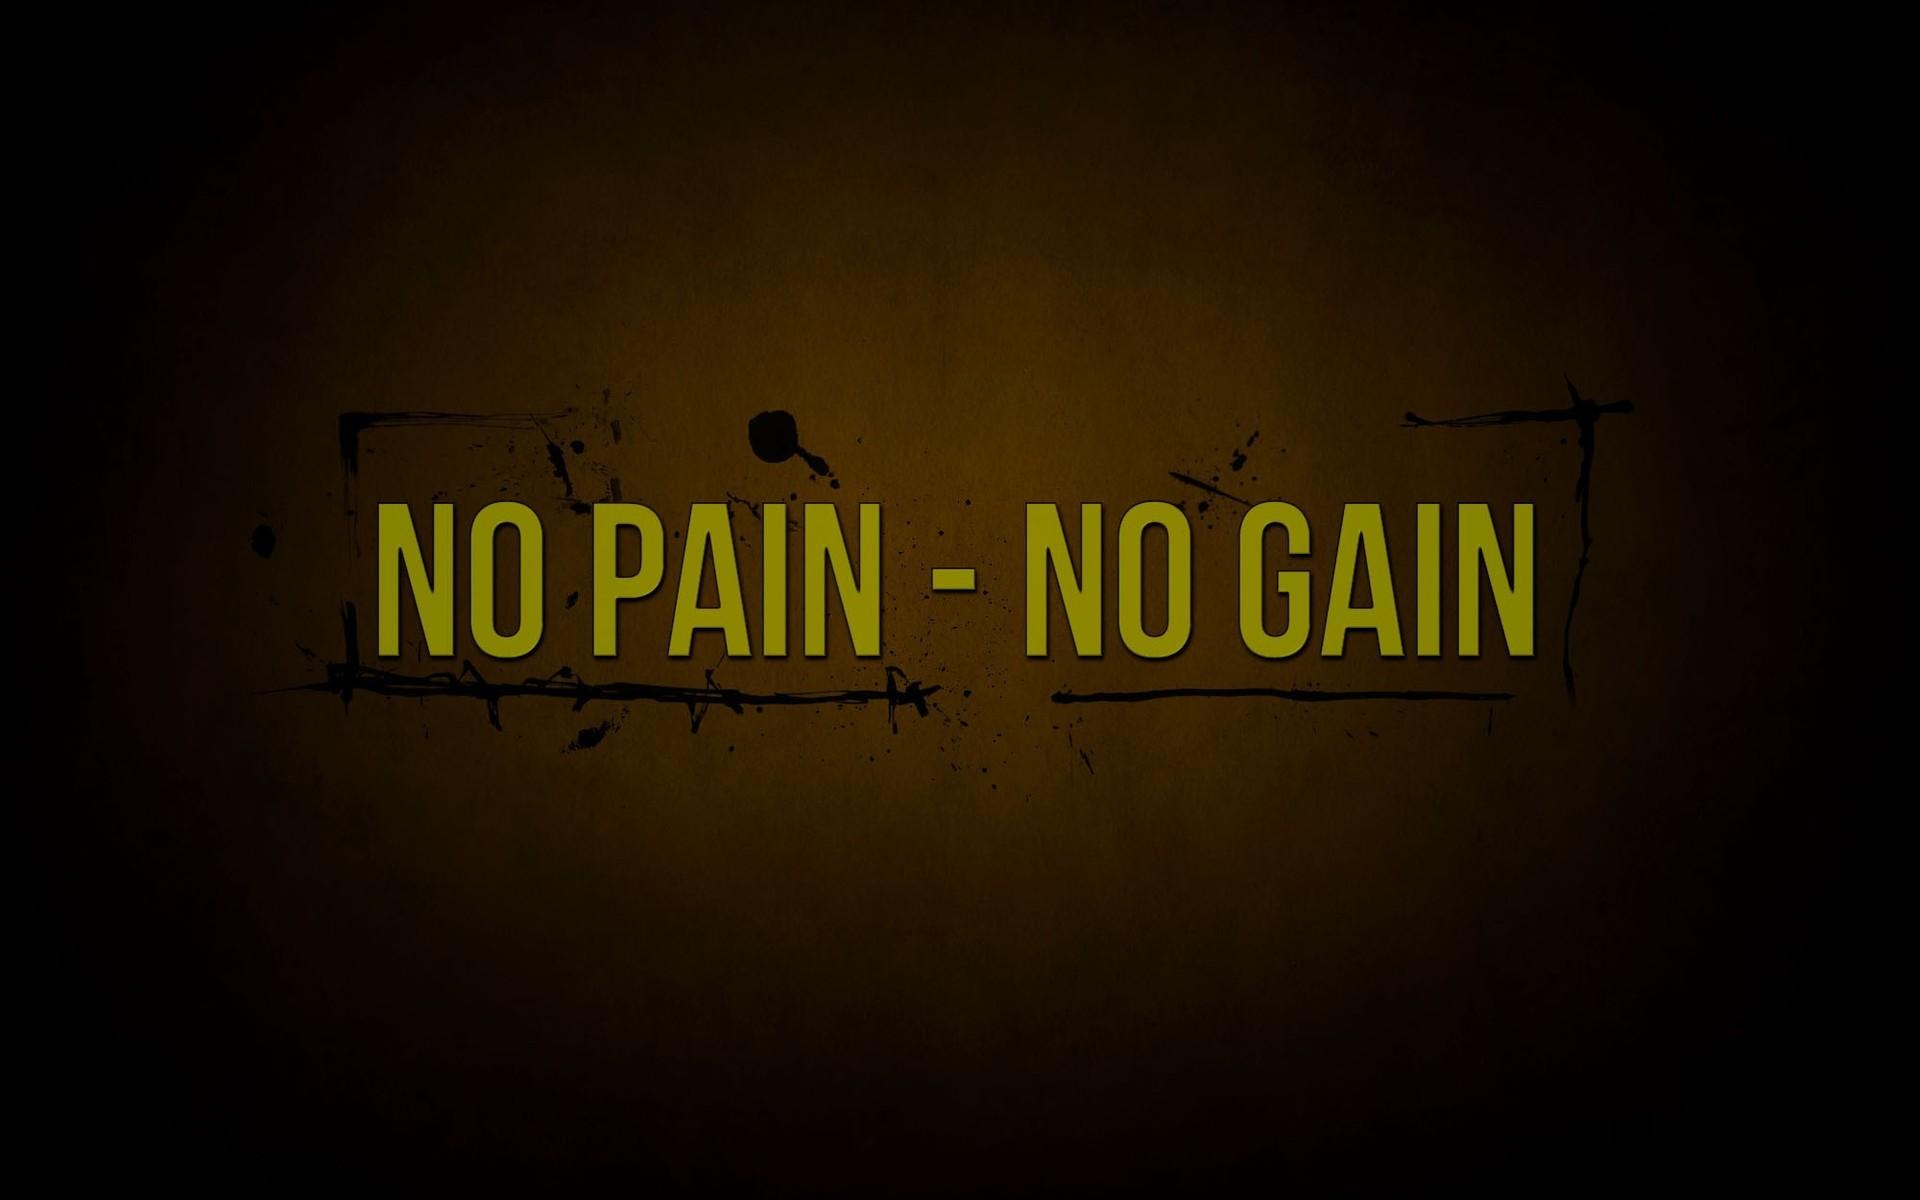 Best Pain And Gain Quotes. QuotesGram